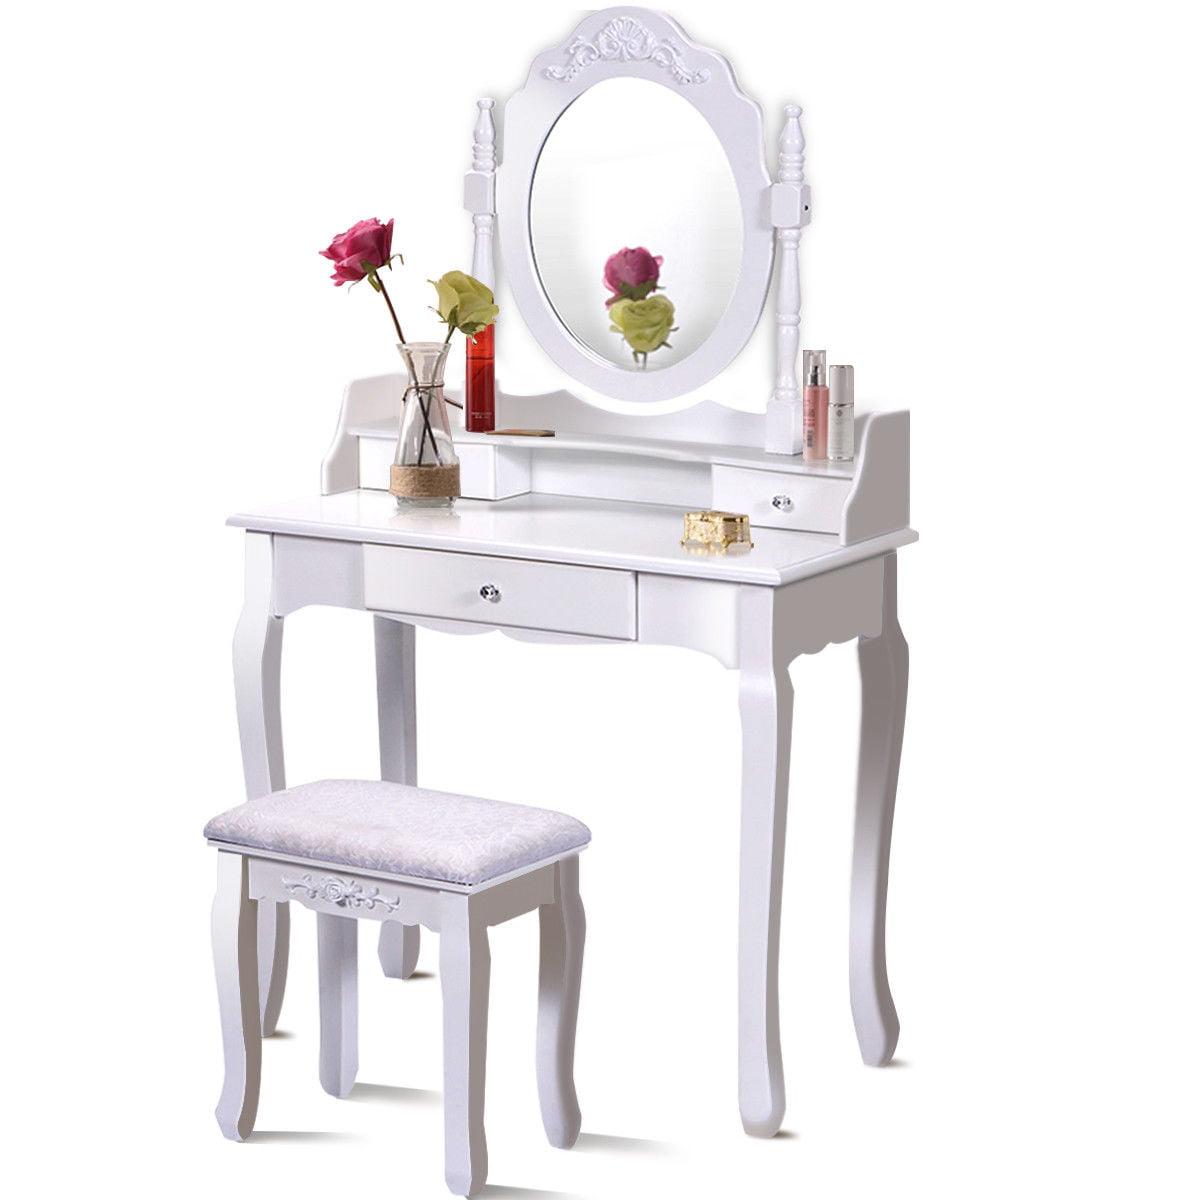 Costway White Vanity Wood Makeup Dressing Table Stool Set bathroom With Mirror + 3 Drawer by Costway